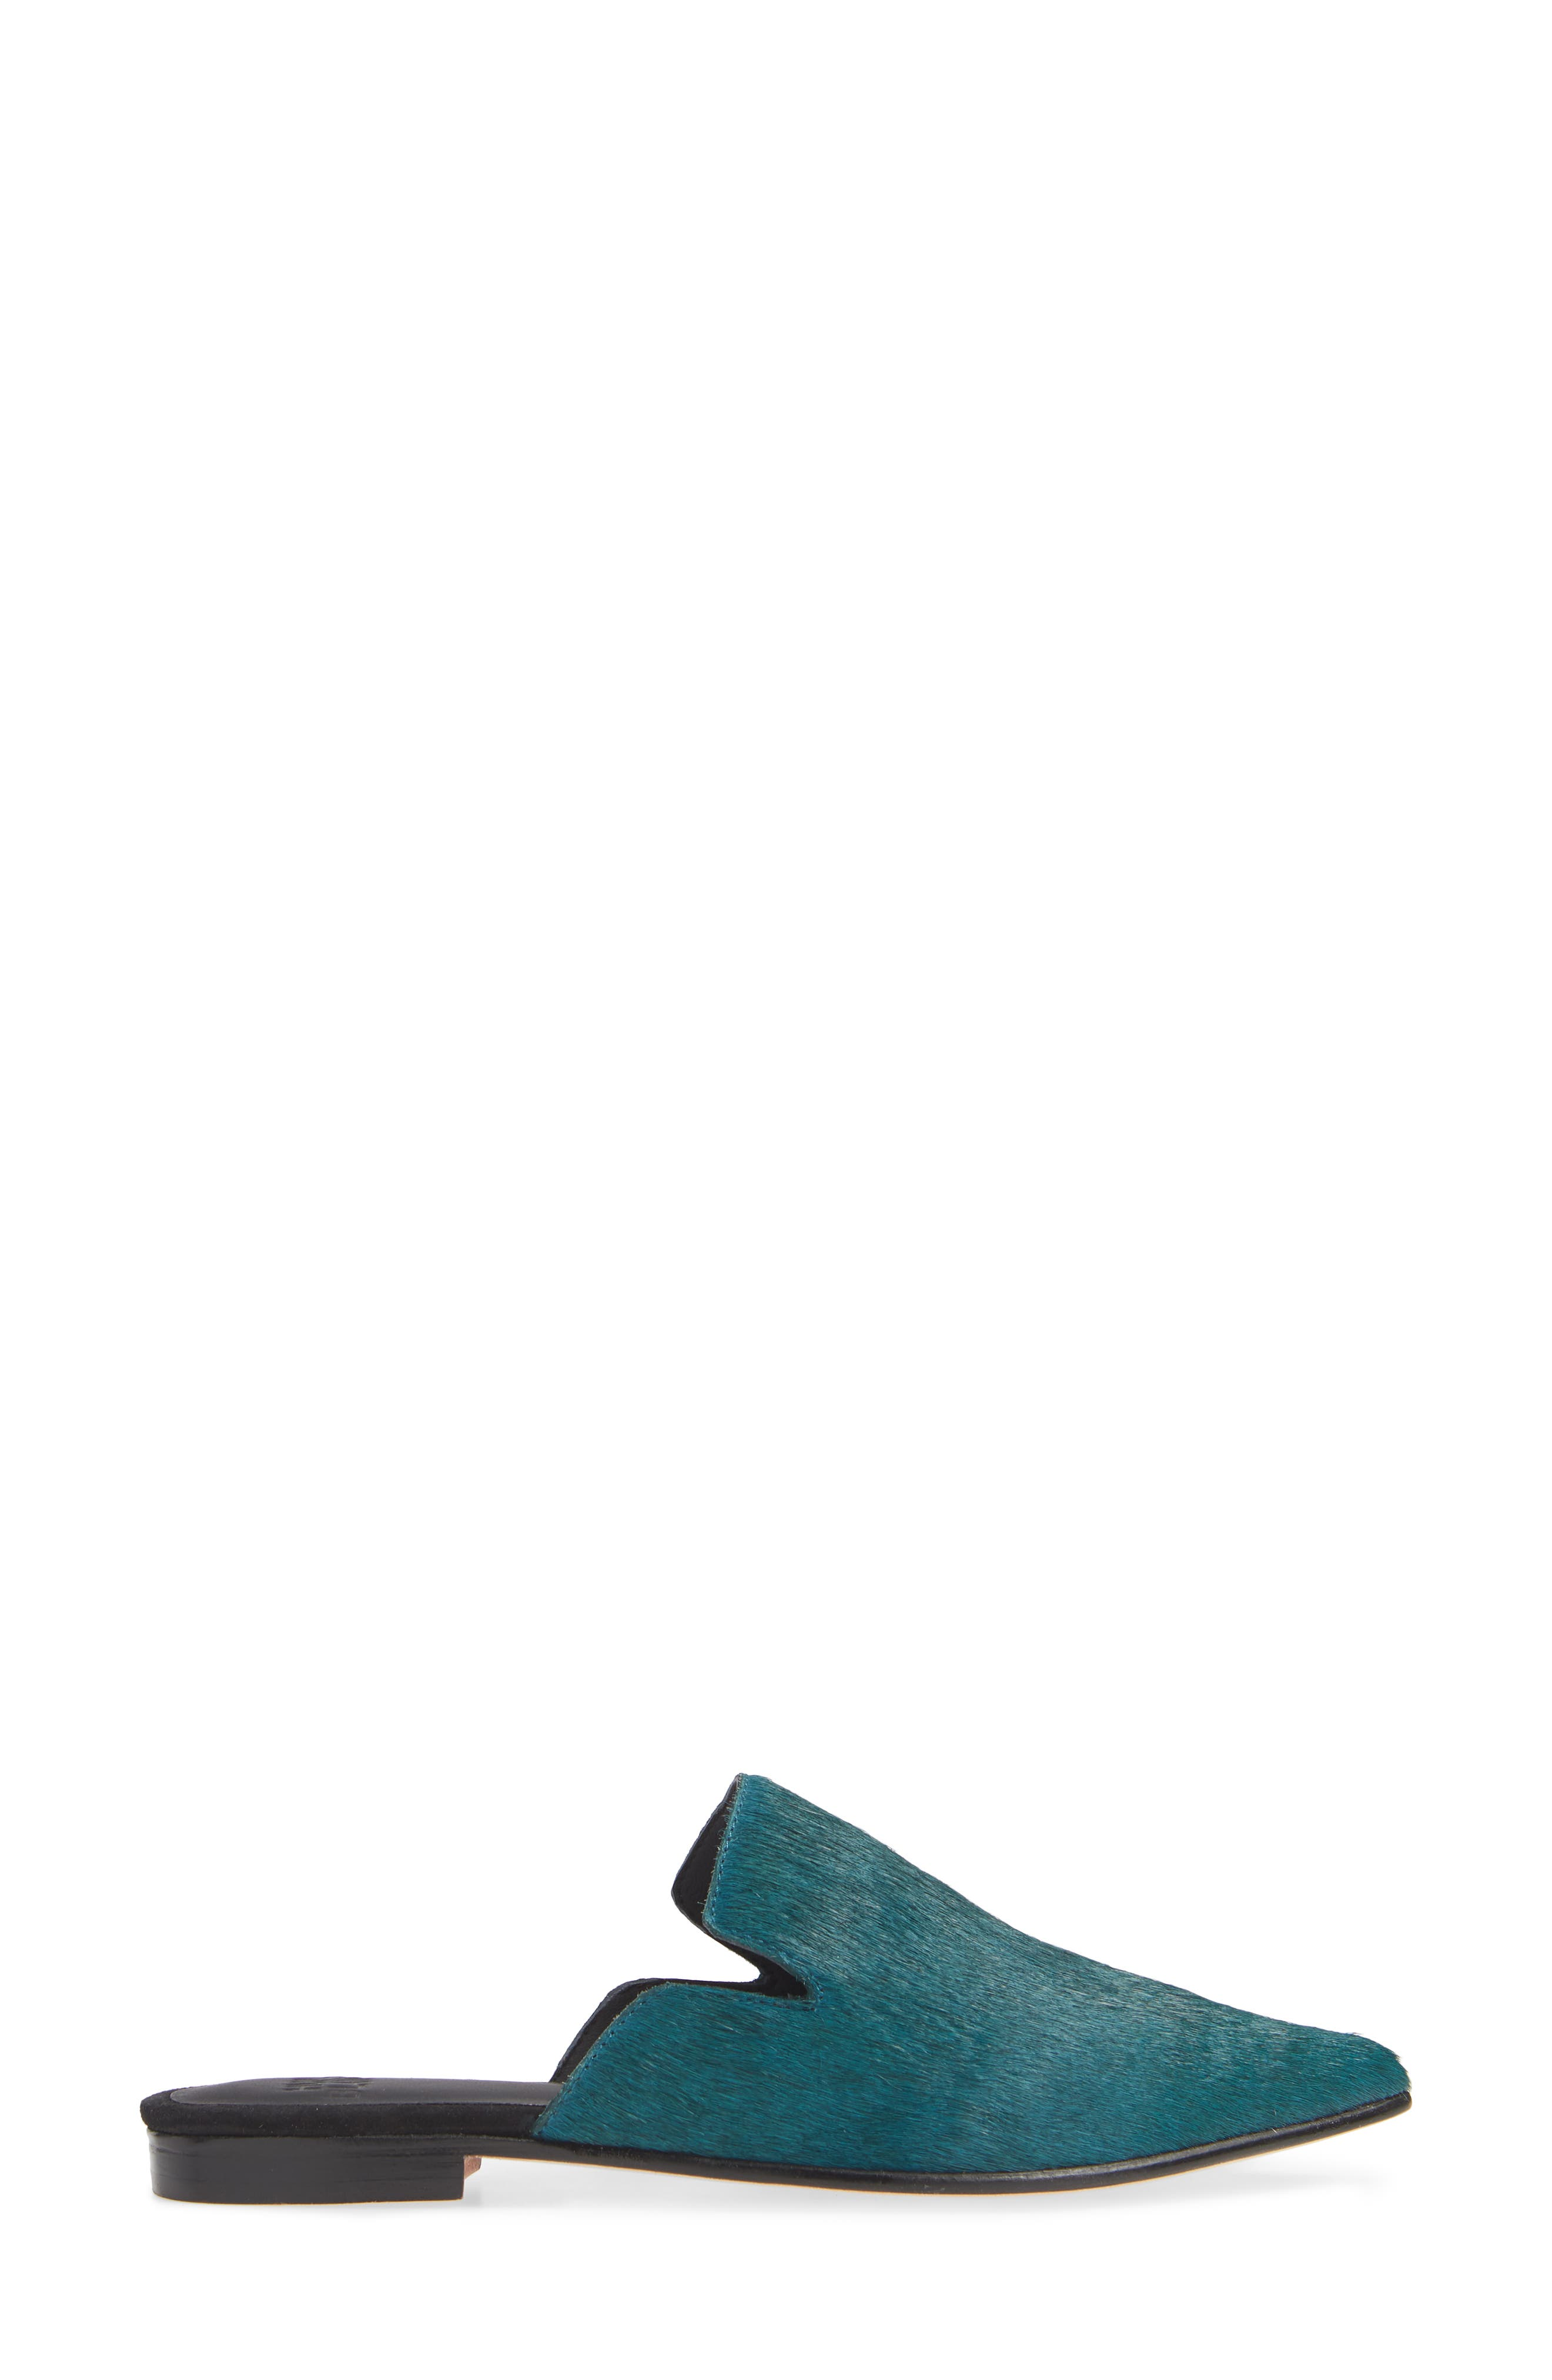 Ilaria Genuine Calf Hair Mule,                             Alternate thumbnail 3, color,                             PINE GREEN CALF HAIR